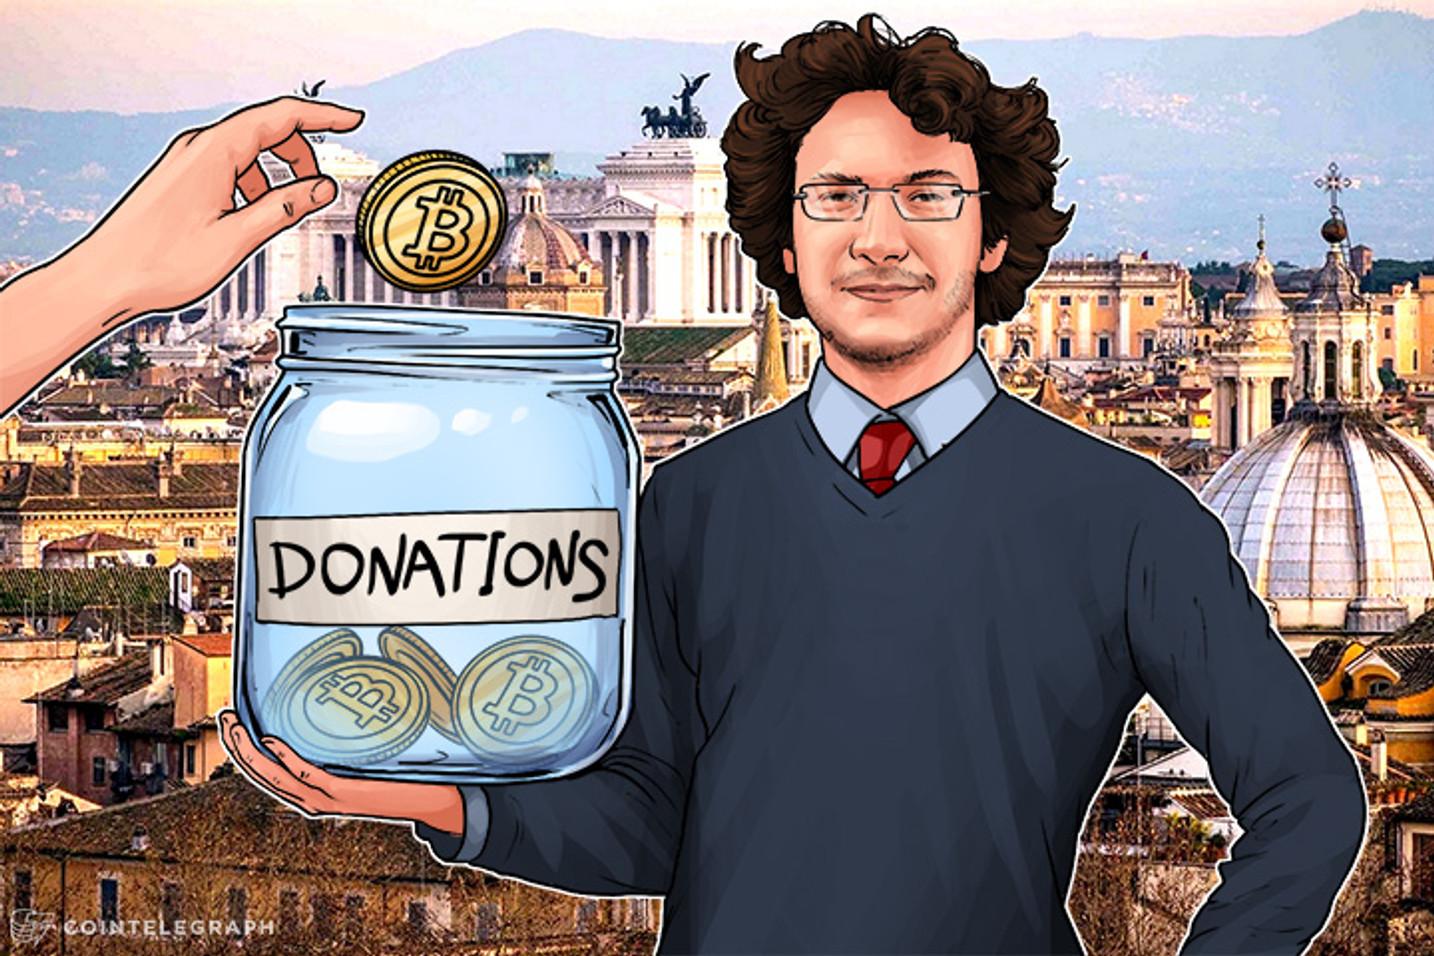 Italian Startup Creates Bitcoin Platform for Transparent Natural Disaster Donations